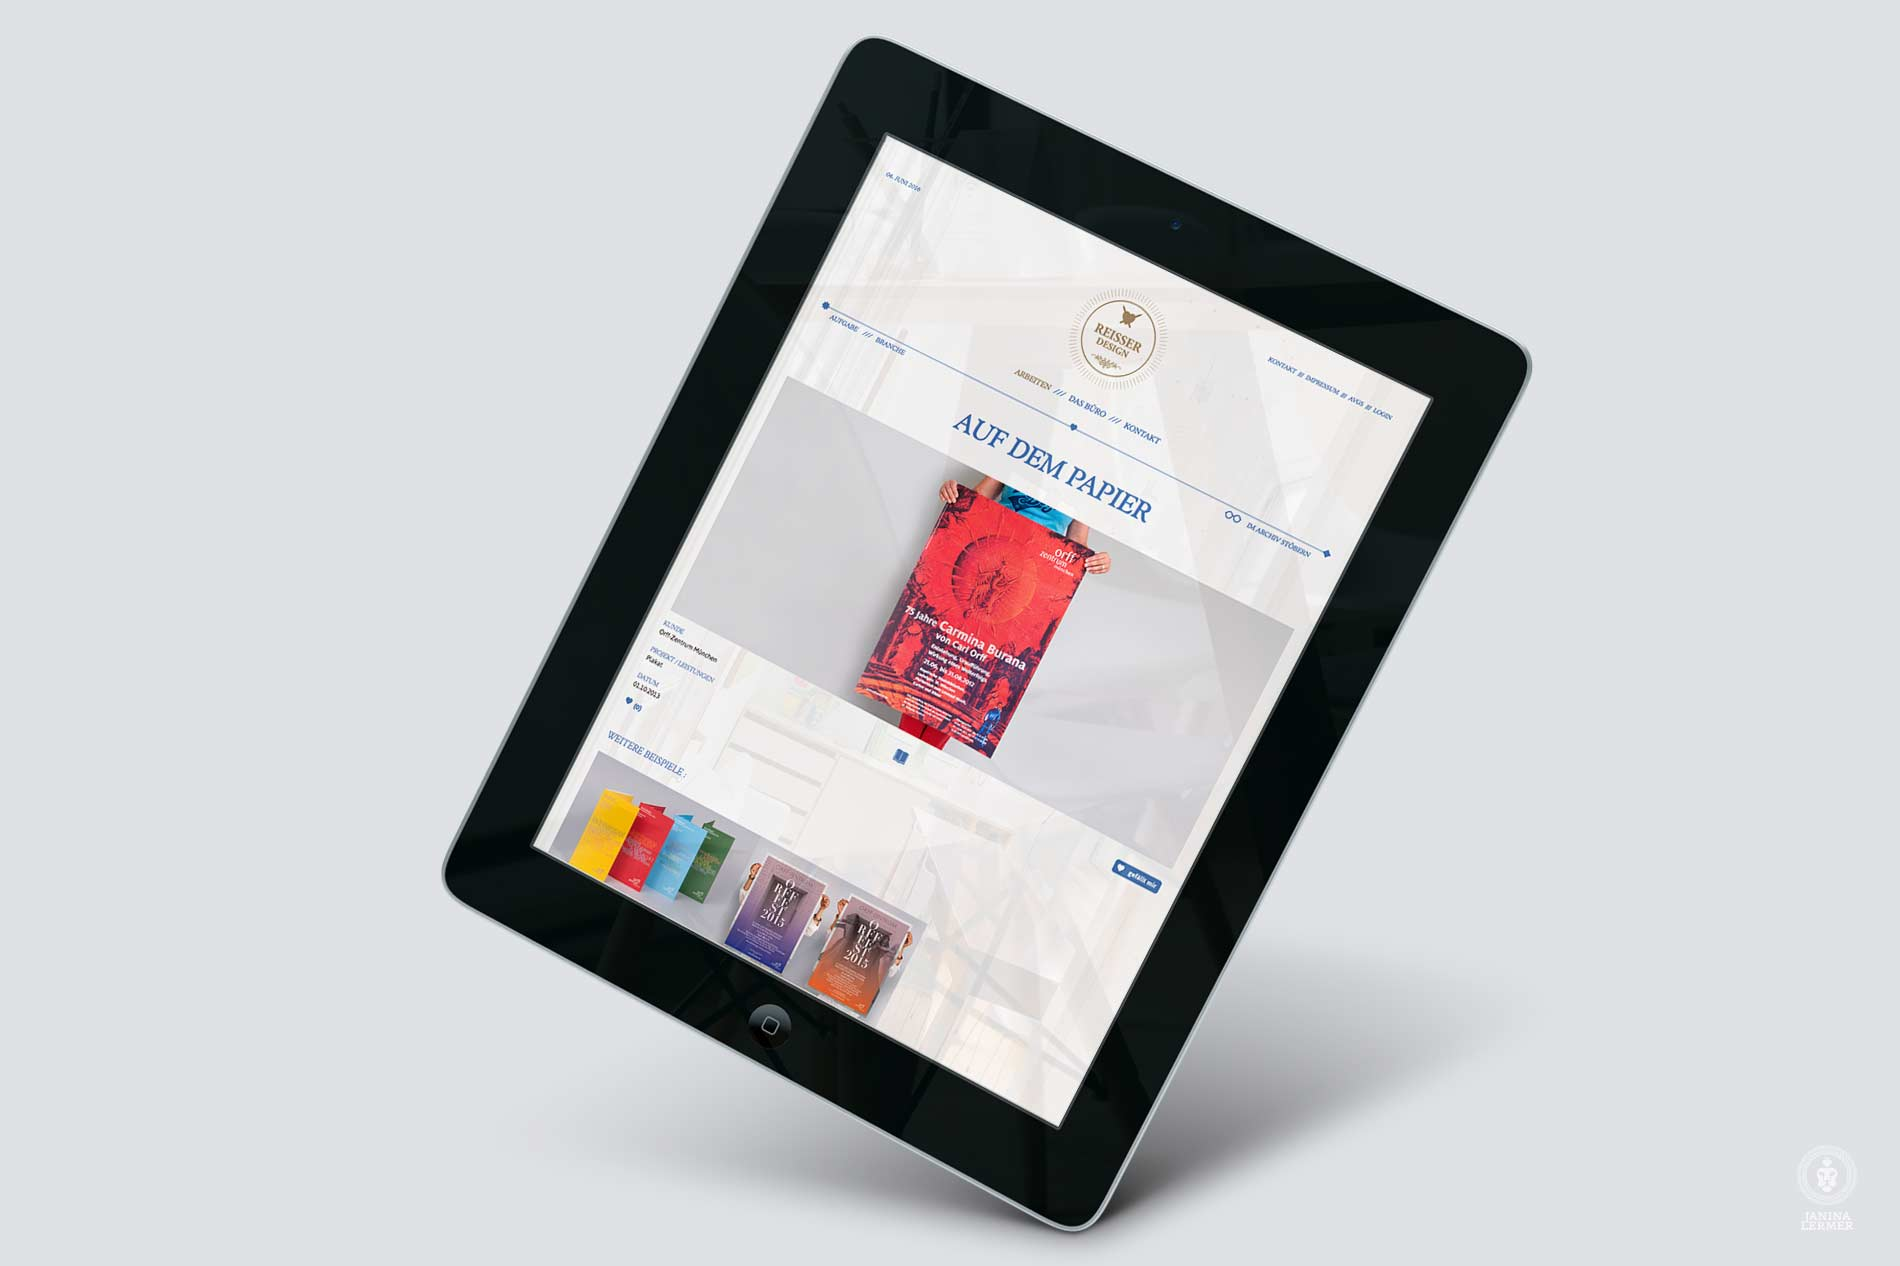 Janina-Lermer-Webseitenkonzept-Webseitengestaltung-Webdesign-Reisserdesign-Ipad-Projekte-Papier-project-paper